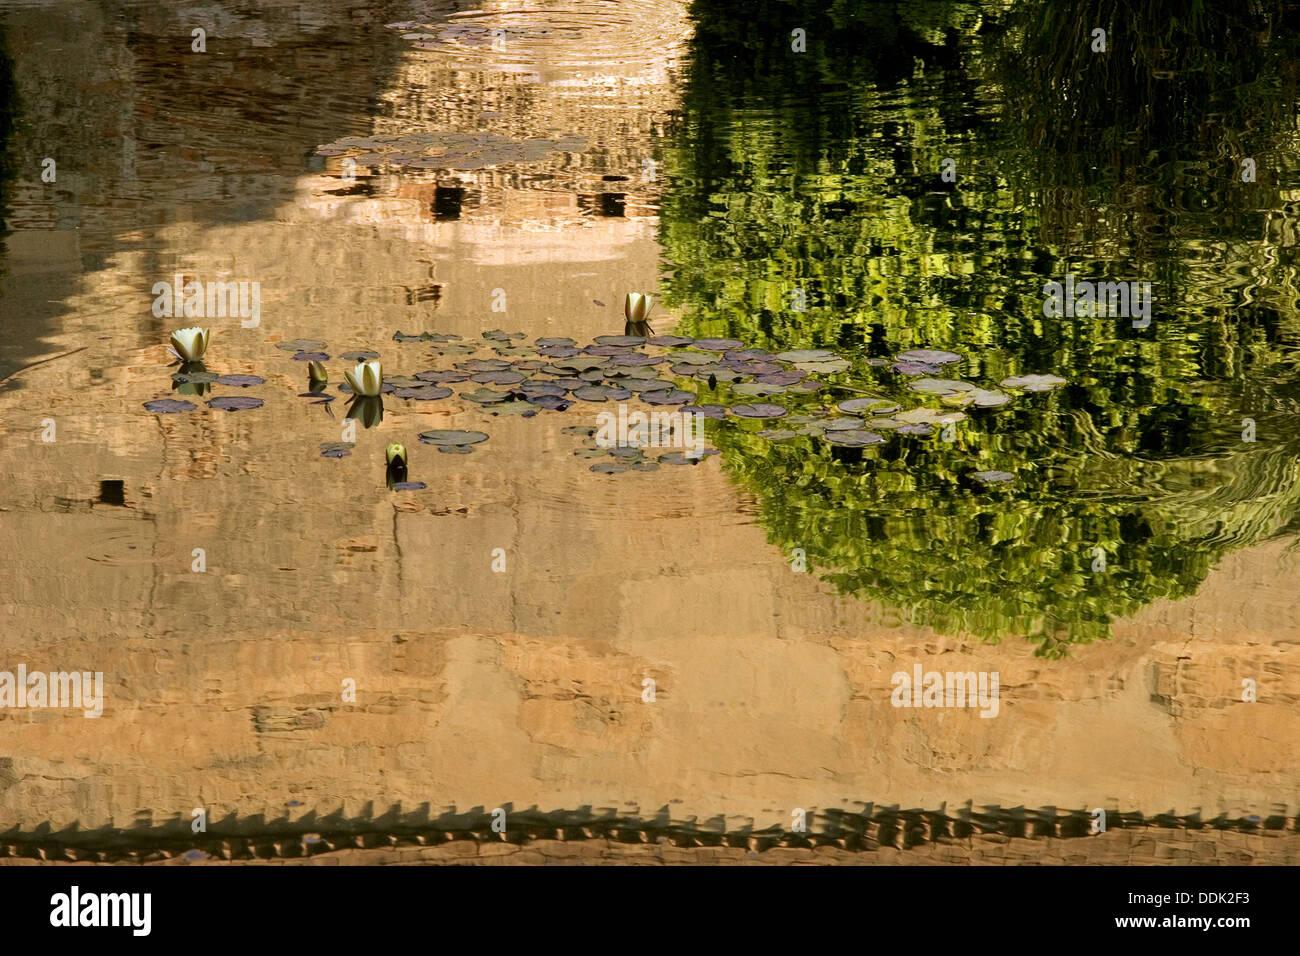 Reflexion at the Al-Mutasim Palace, inside the moorish Alcazaba of Almeria. Almería. Andalucia. Spain. - Stock Image